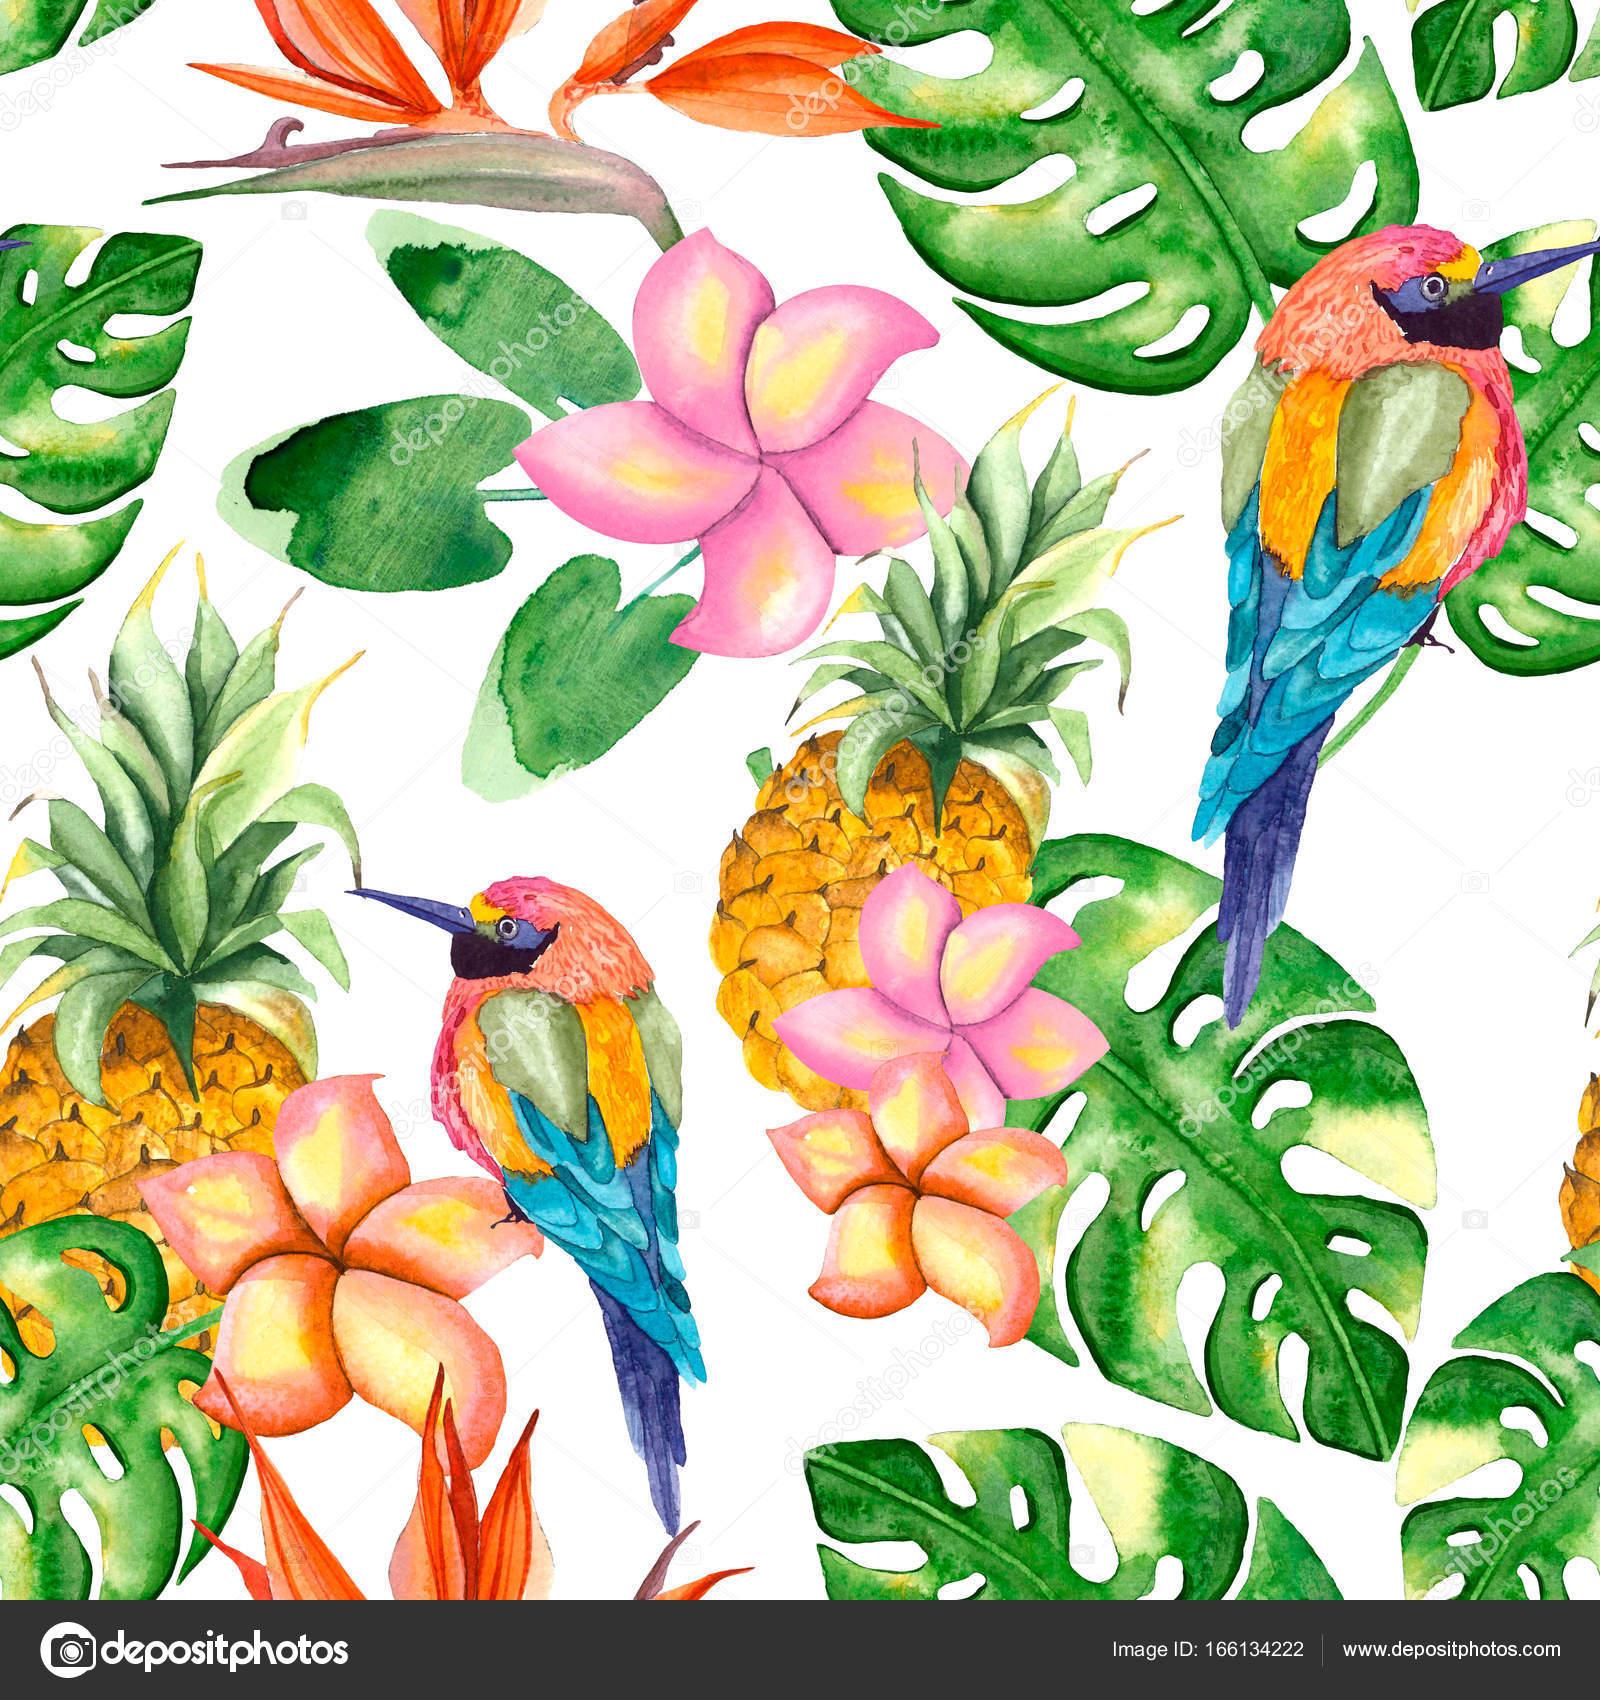 Muster der Vögel, Blumen und Blätter — Stockfoto © Lia.N.P #166134222